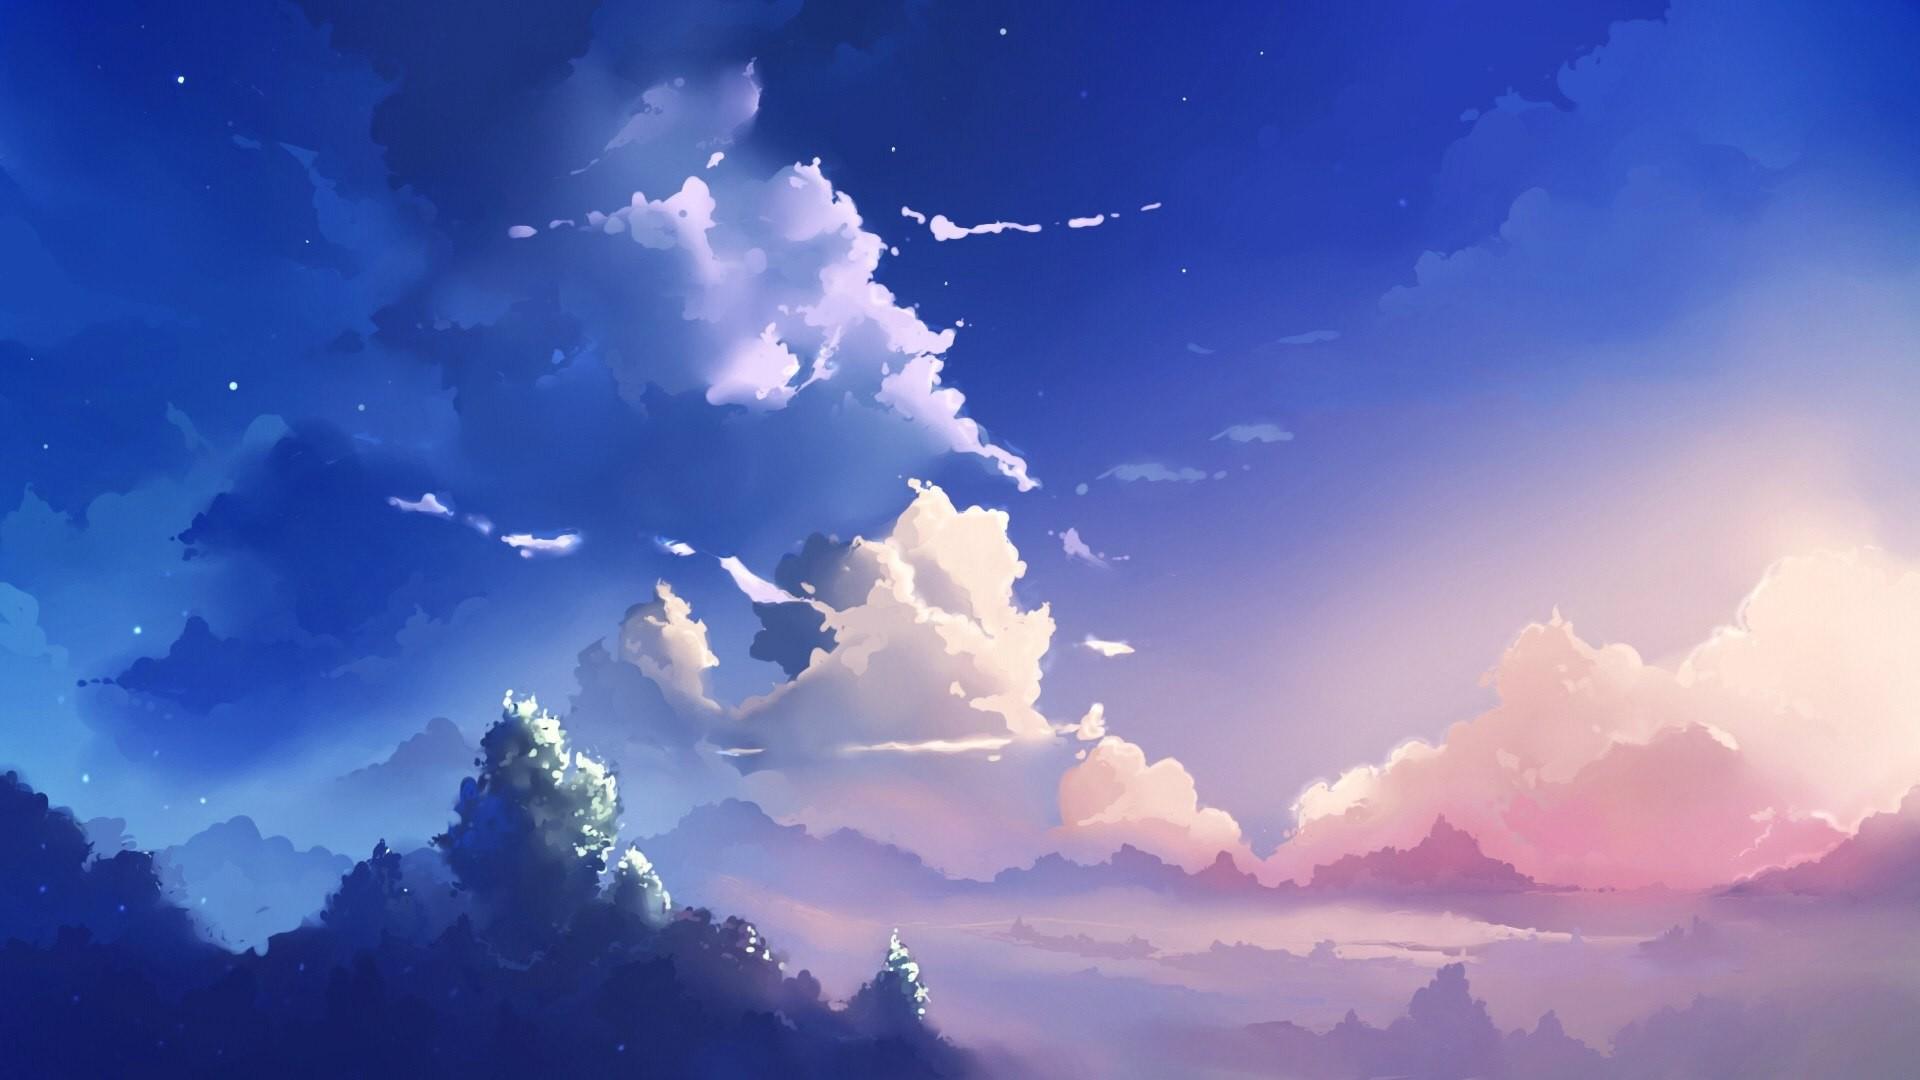 Sky Scenery Wallpaper.